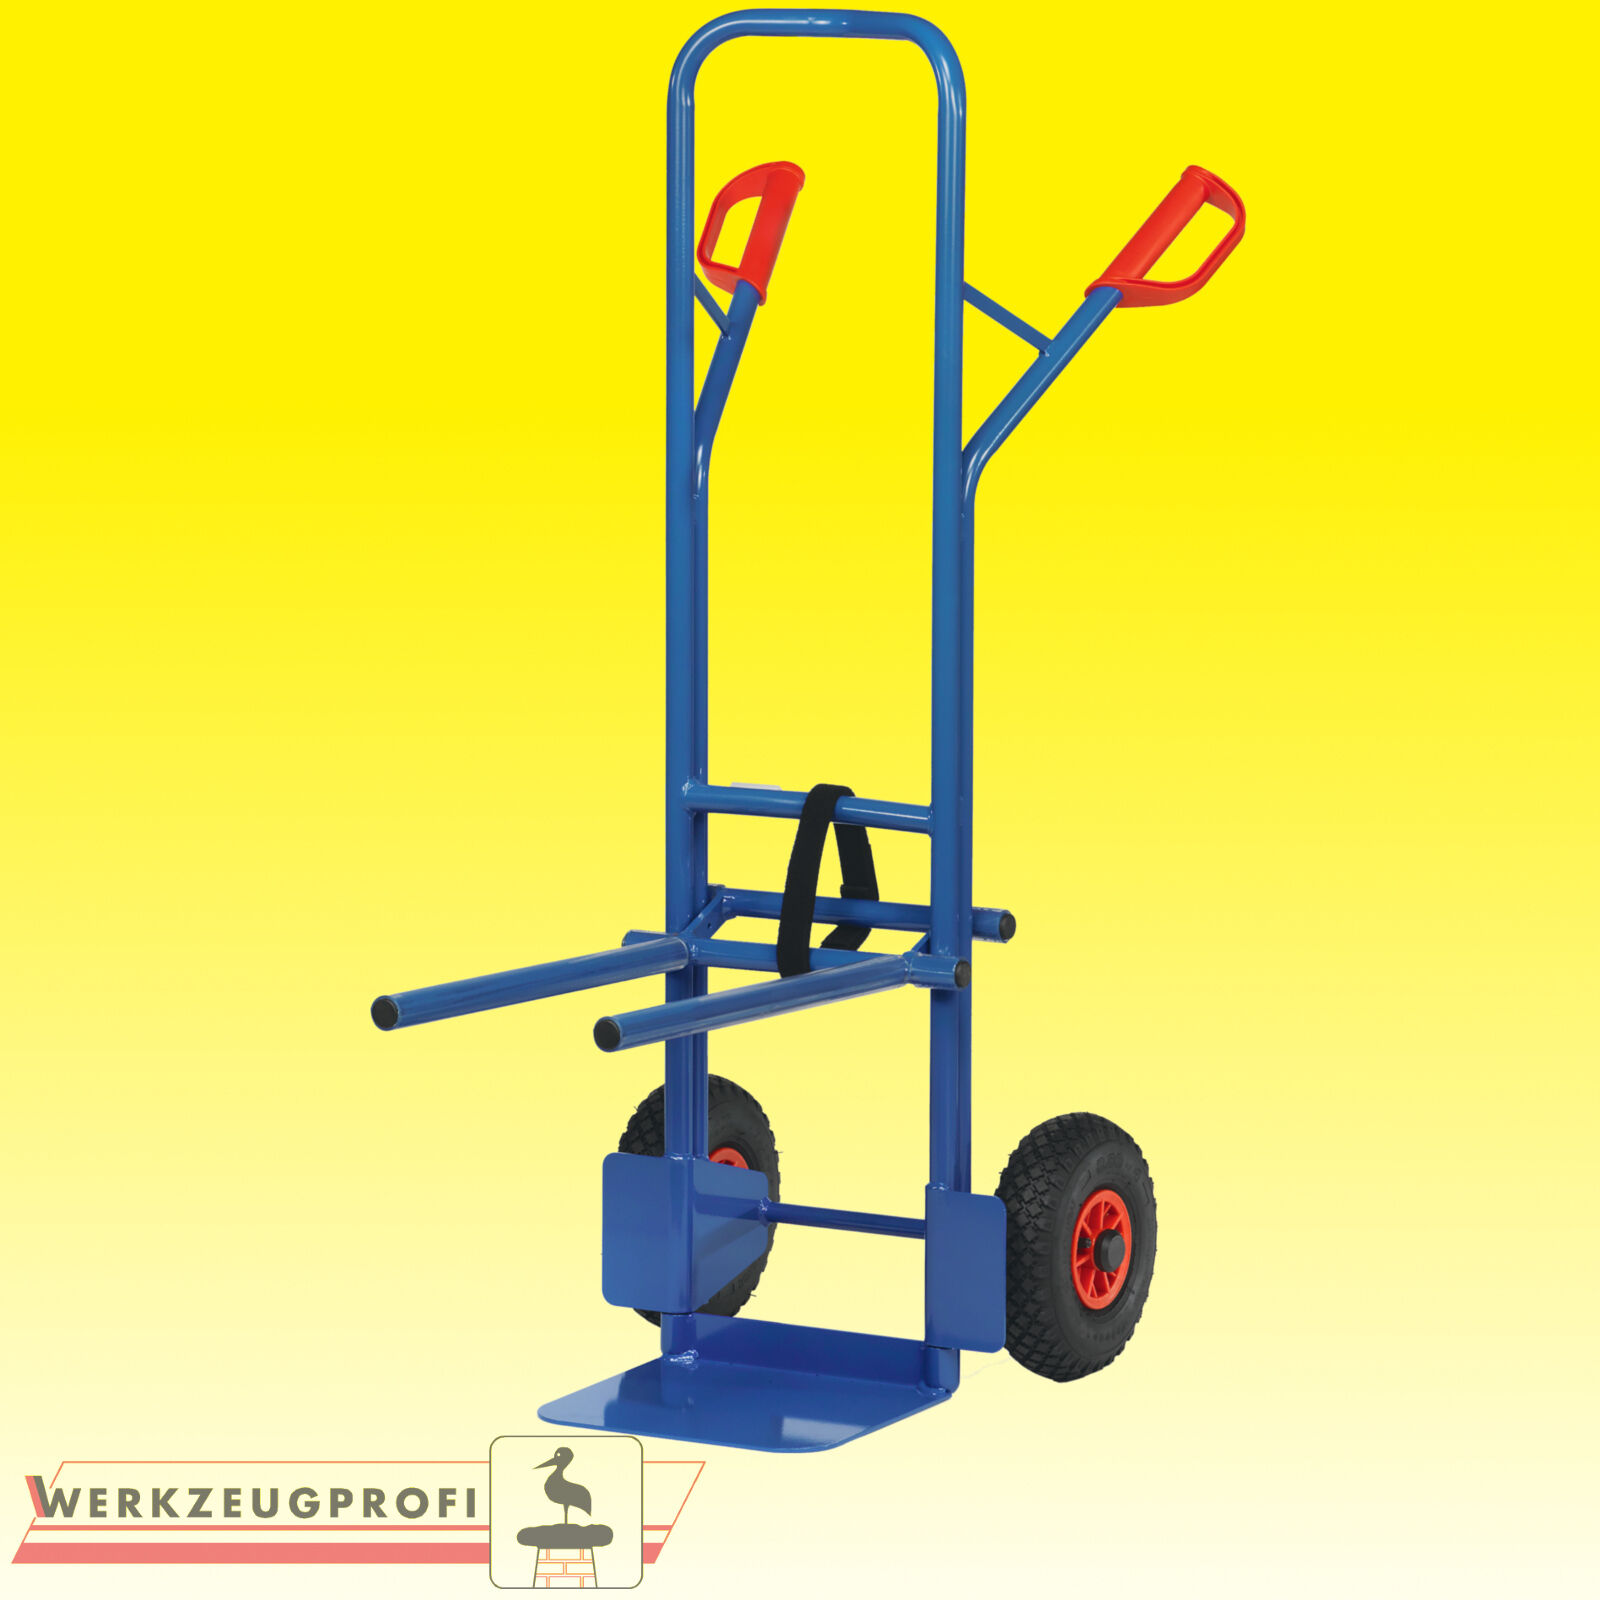 FETRA Stuhlkarre B1335L 300 70 kg Tragkraft  Transportkarre Stapelkarre Karre